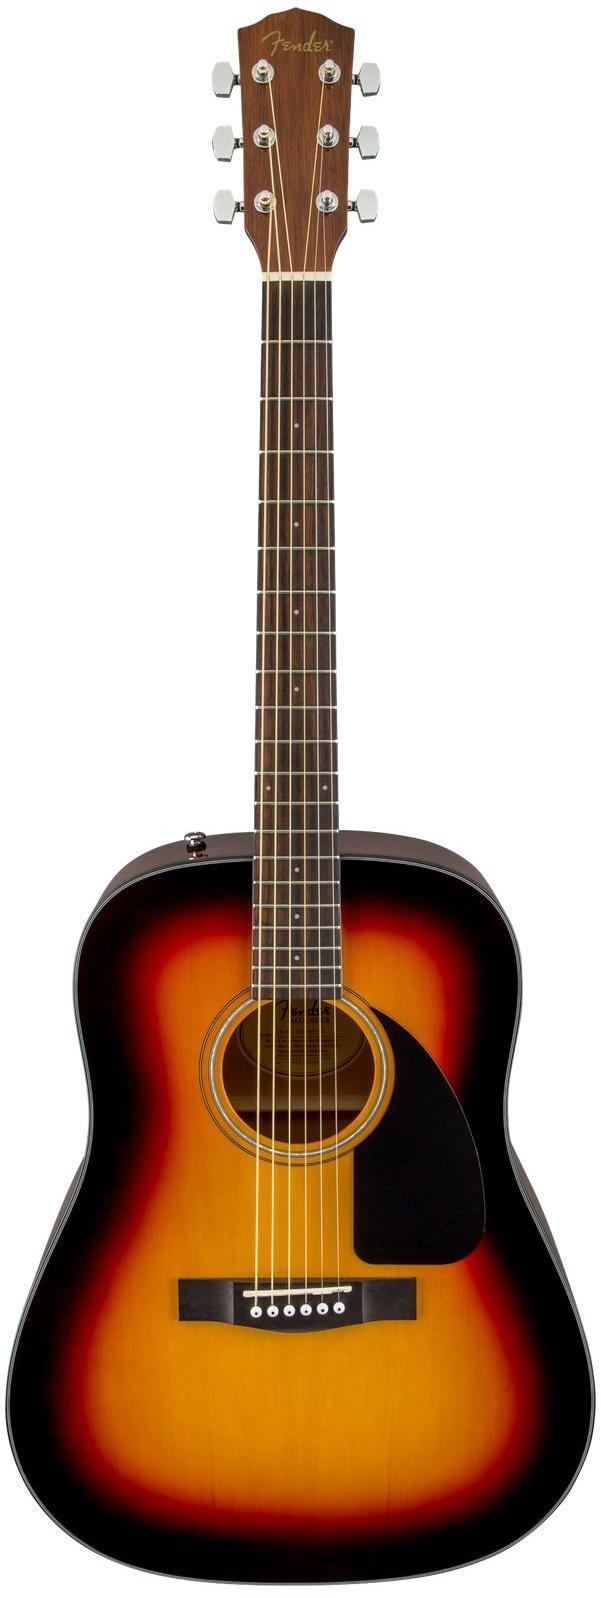 Fender CD-60 Dreadnought V3 w/Case Walnut Fingerboard - Sunburst